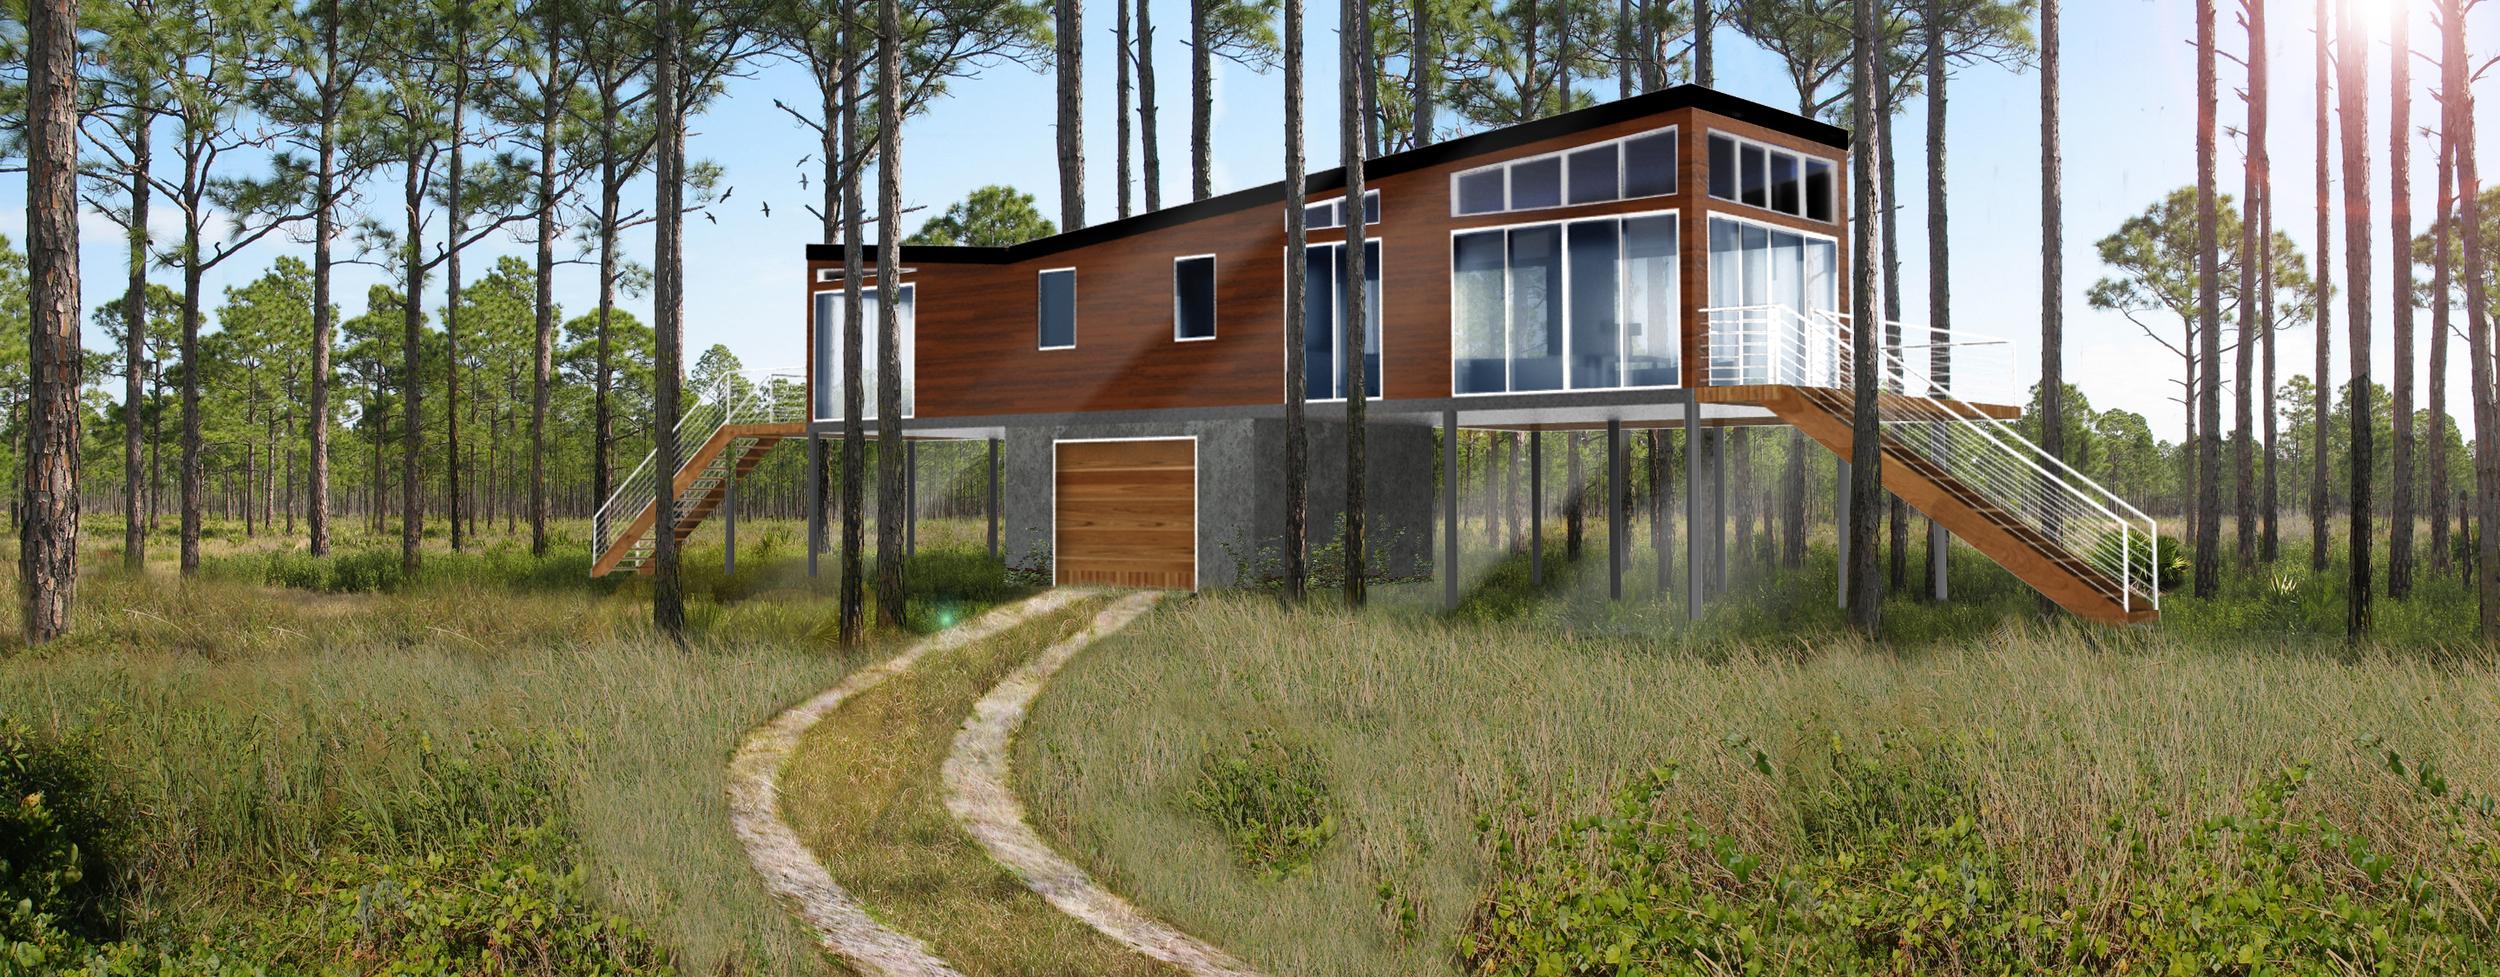 Everglades Residence